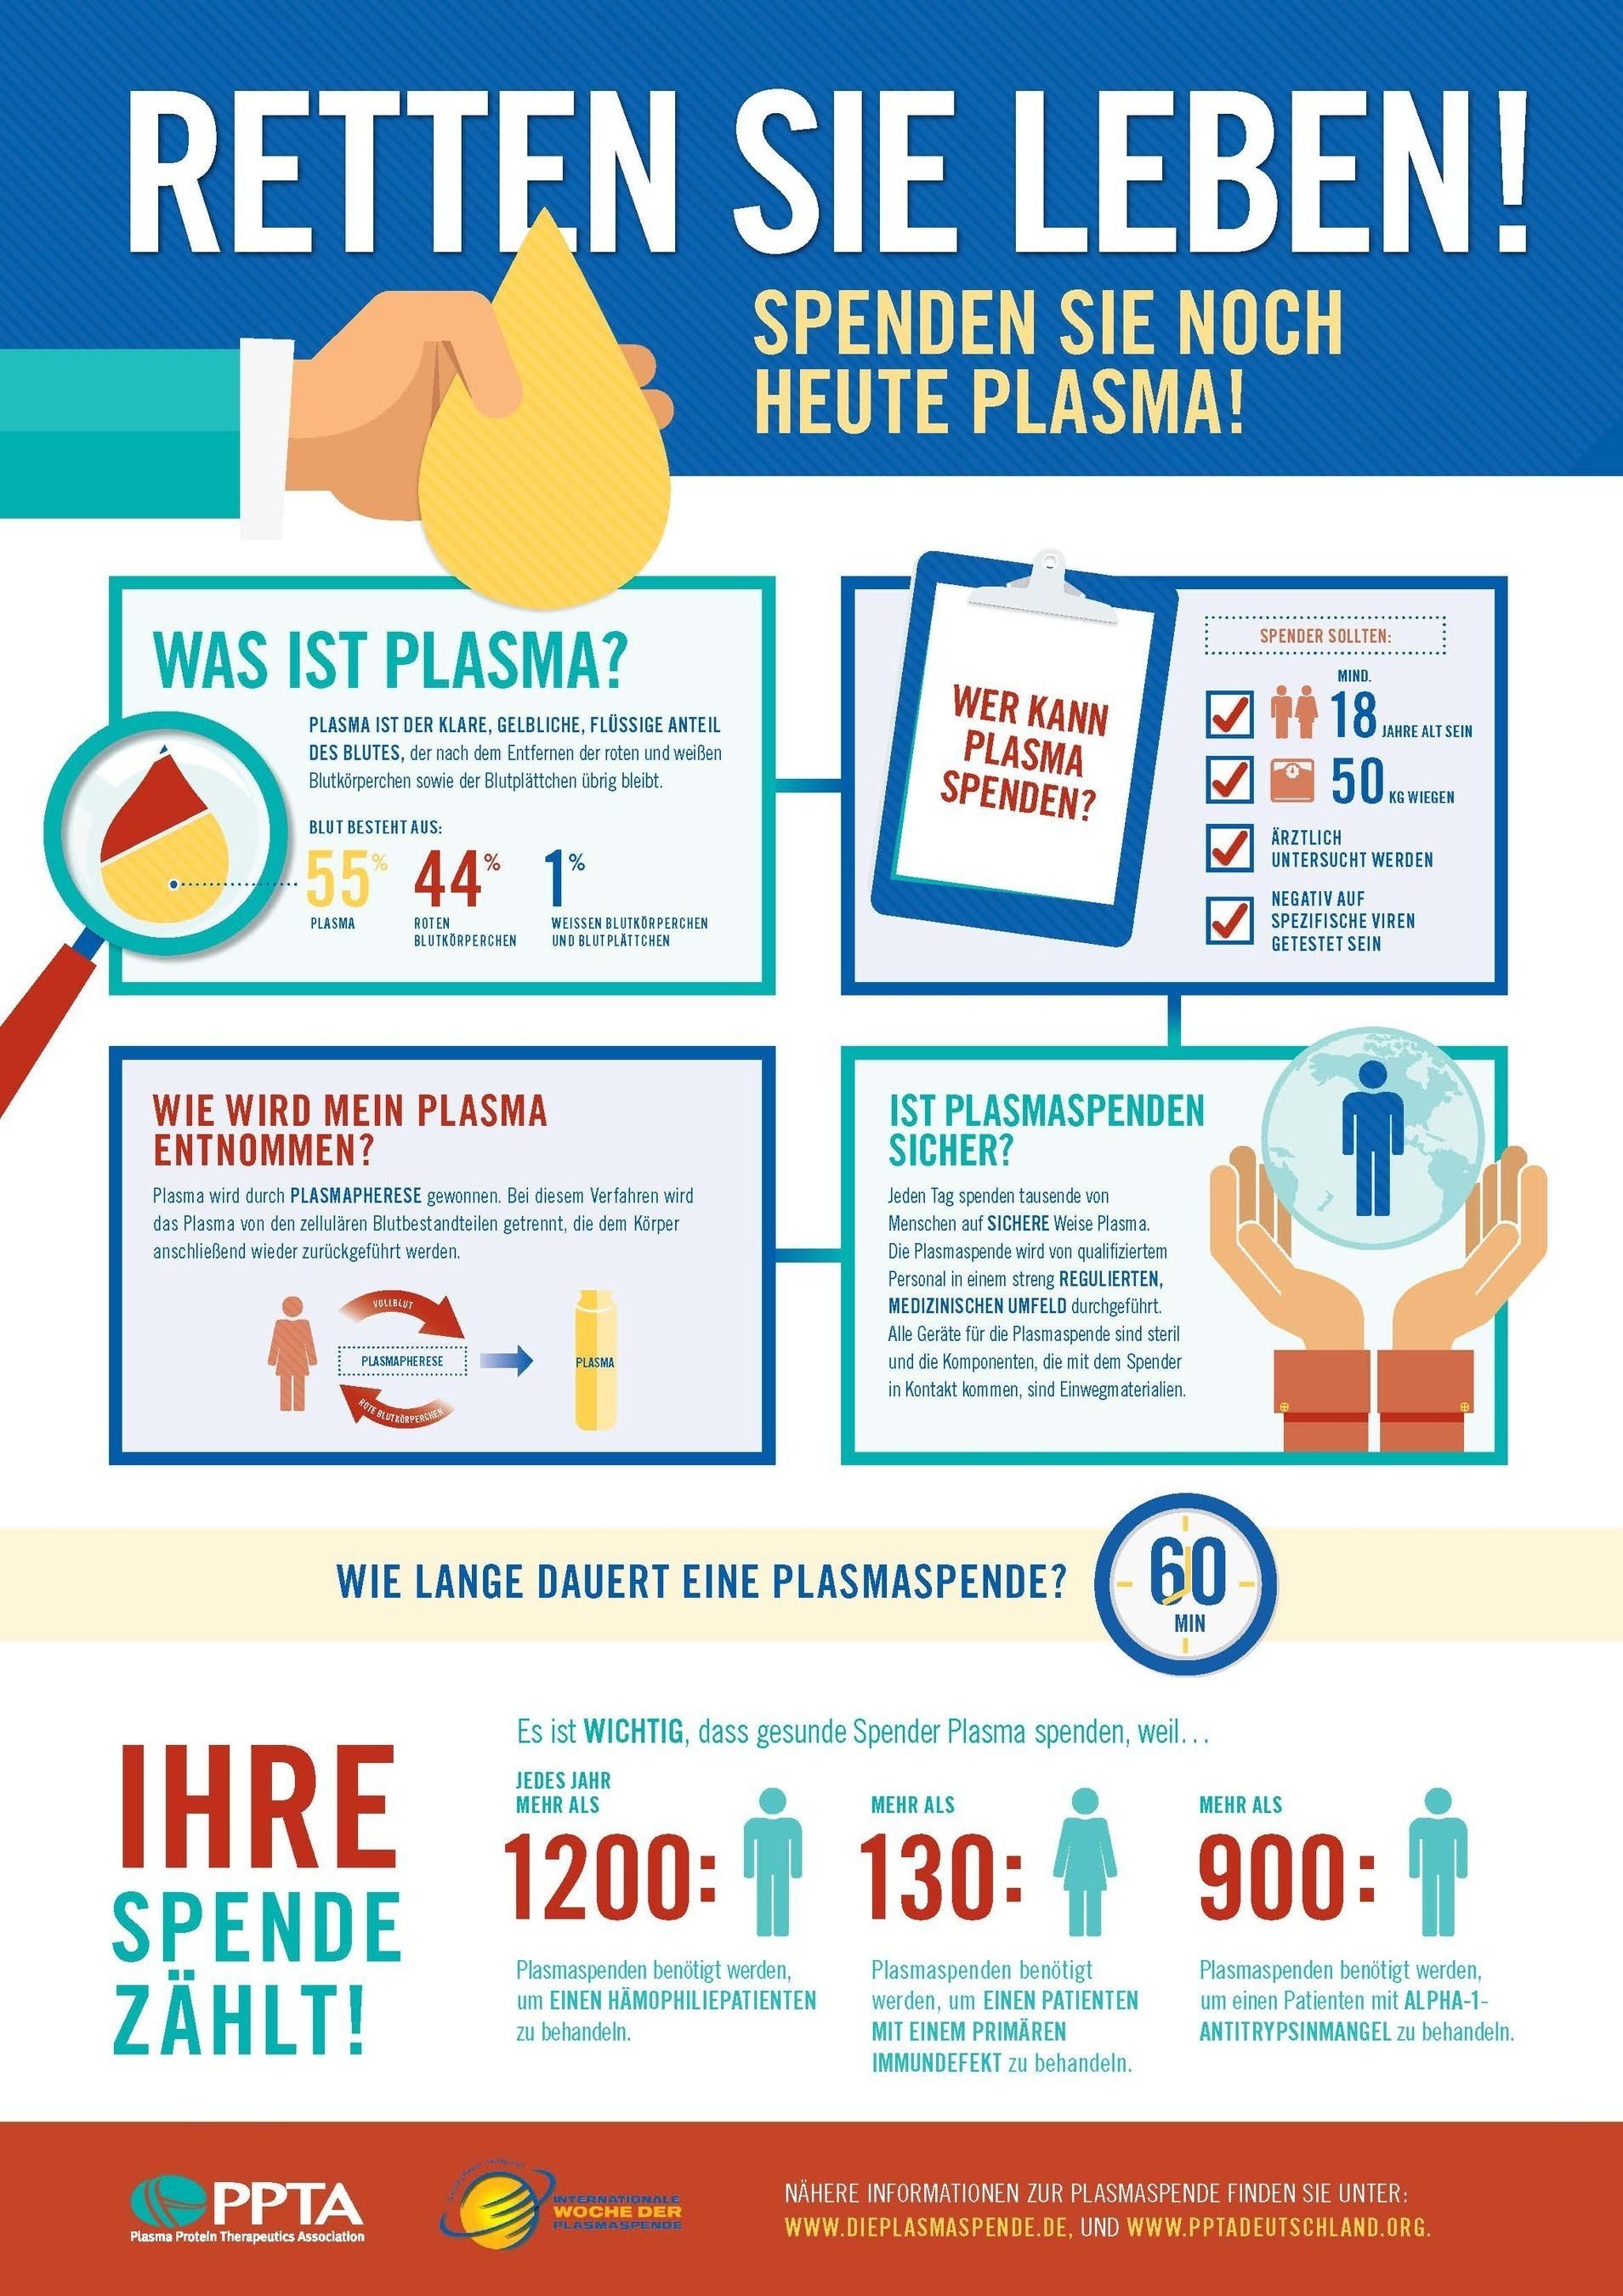 Plasma spenden - Leben retten.  Jede Plasmaspende zählt.